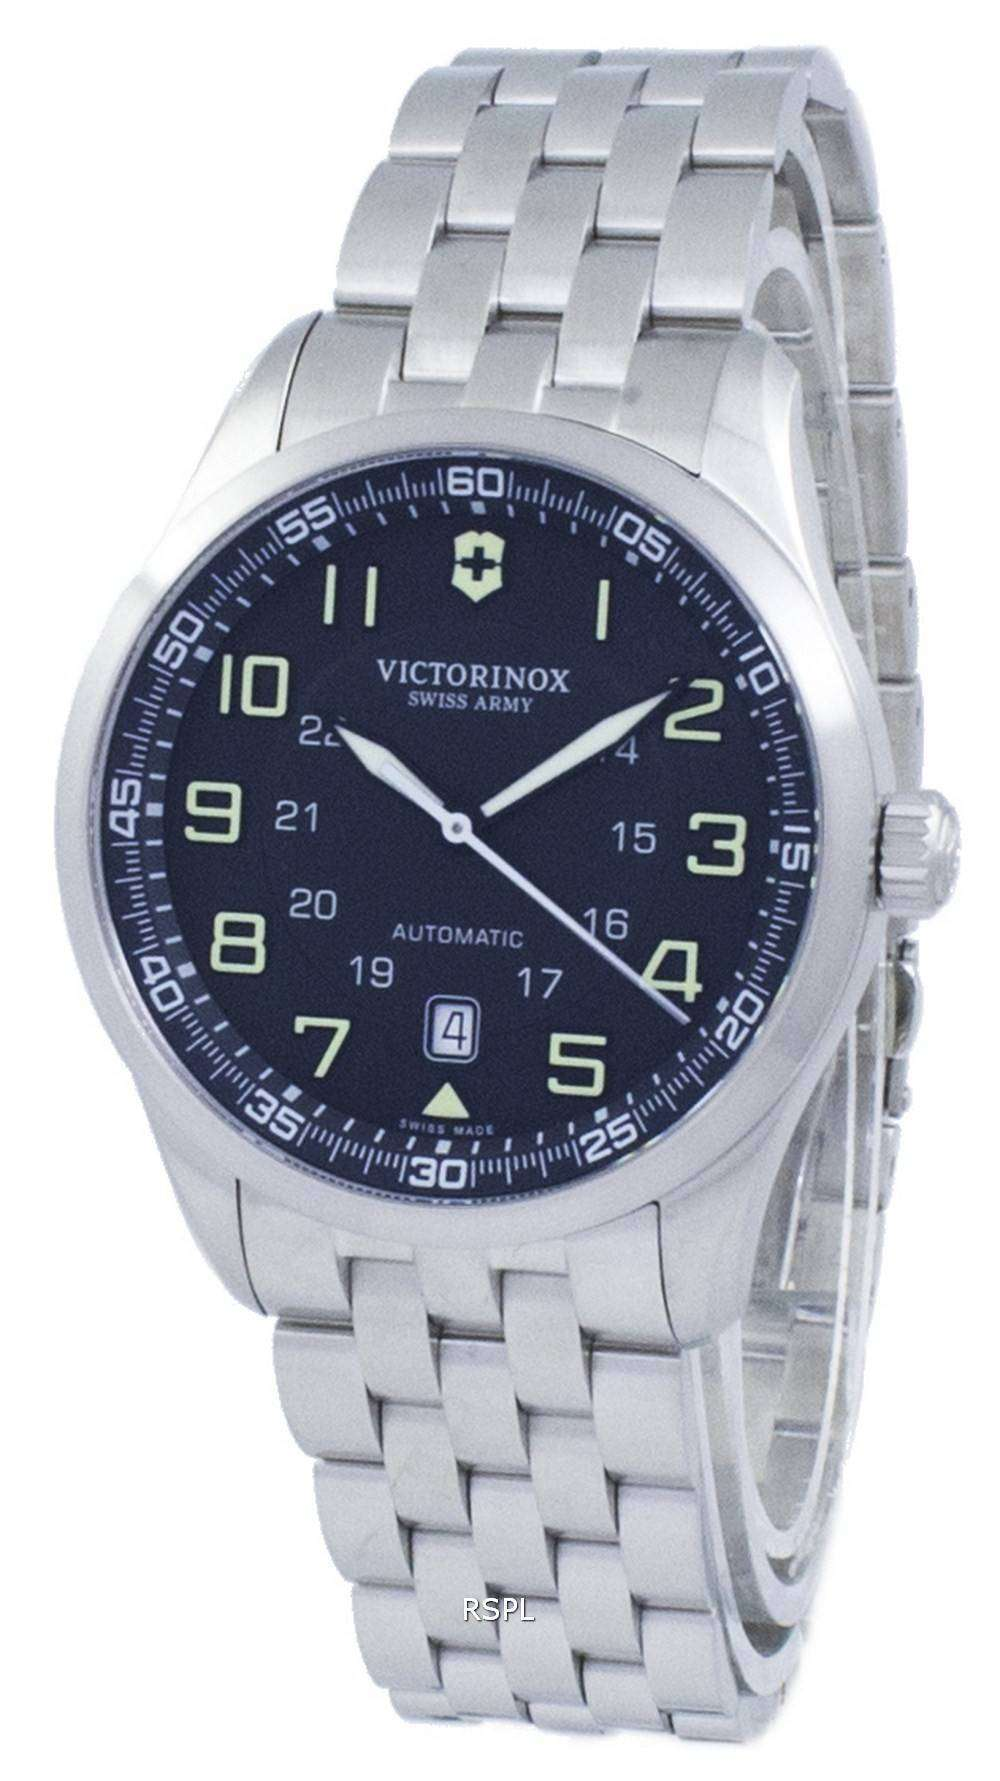 Airboss ビクトリノックス スイスアーミー自動 241508 男性用の腕時計